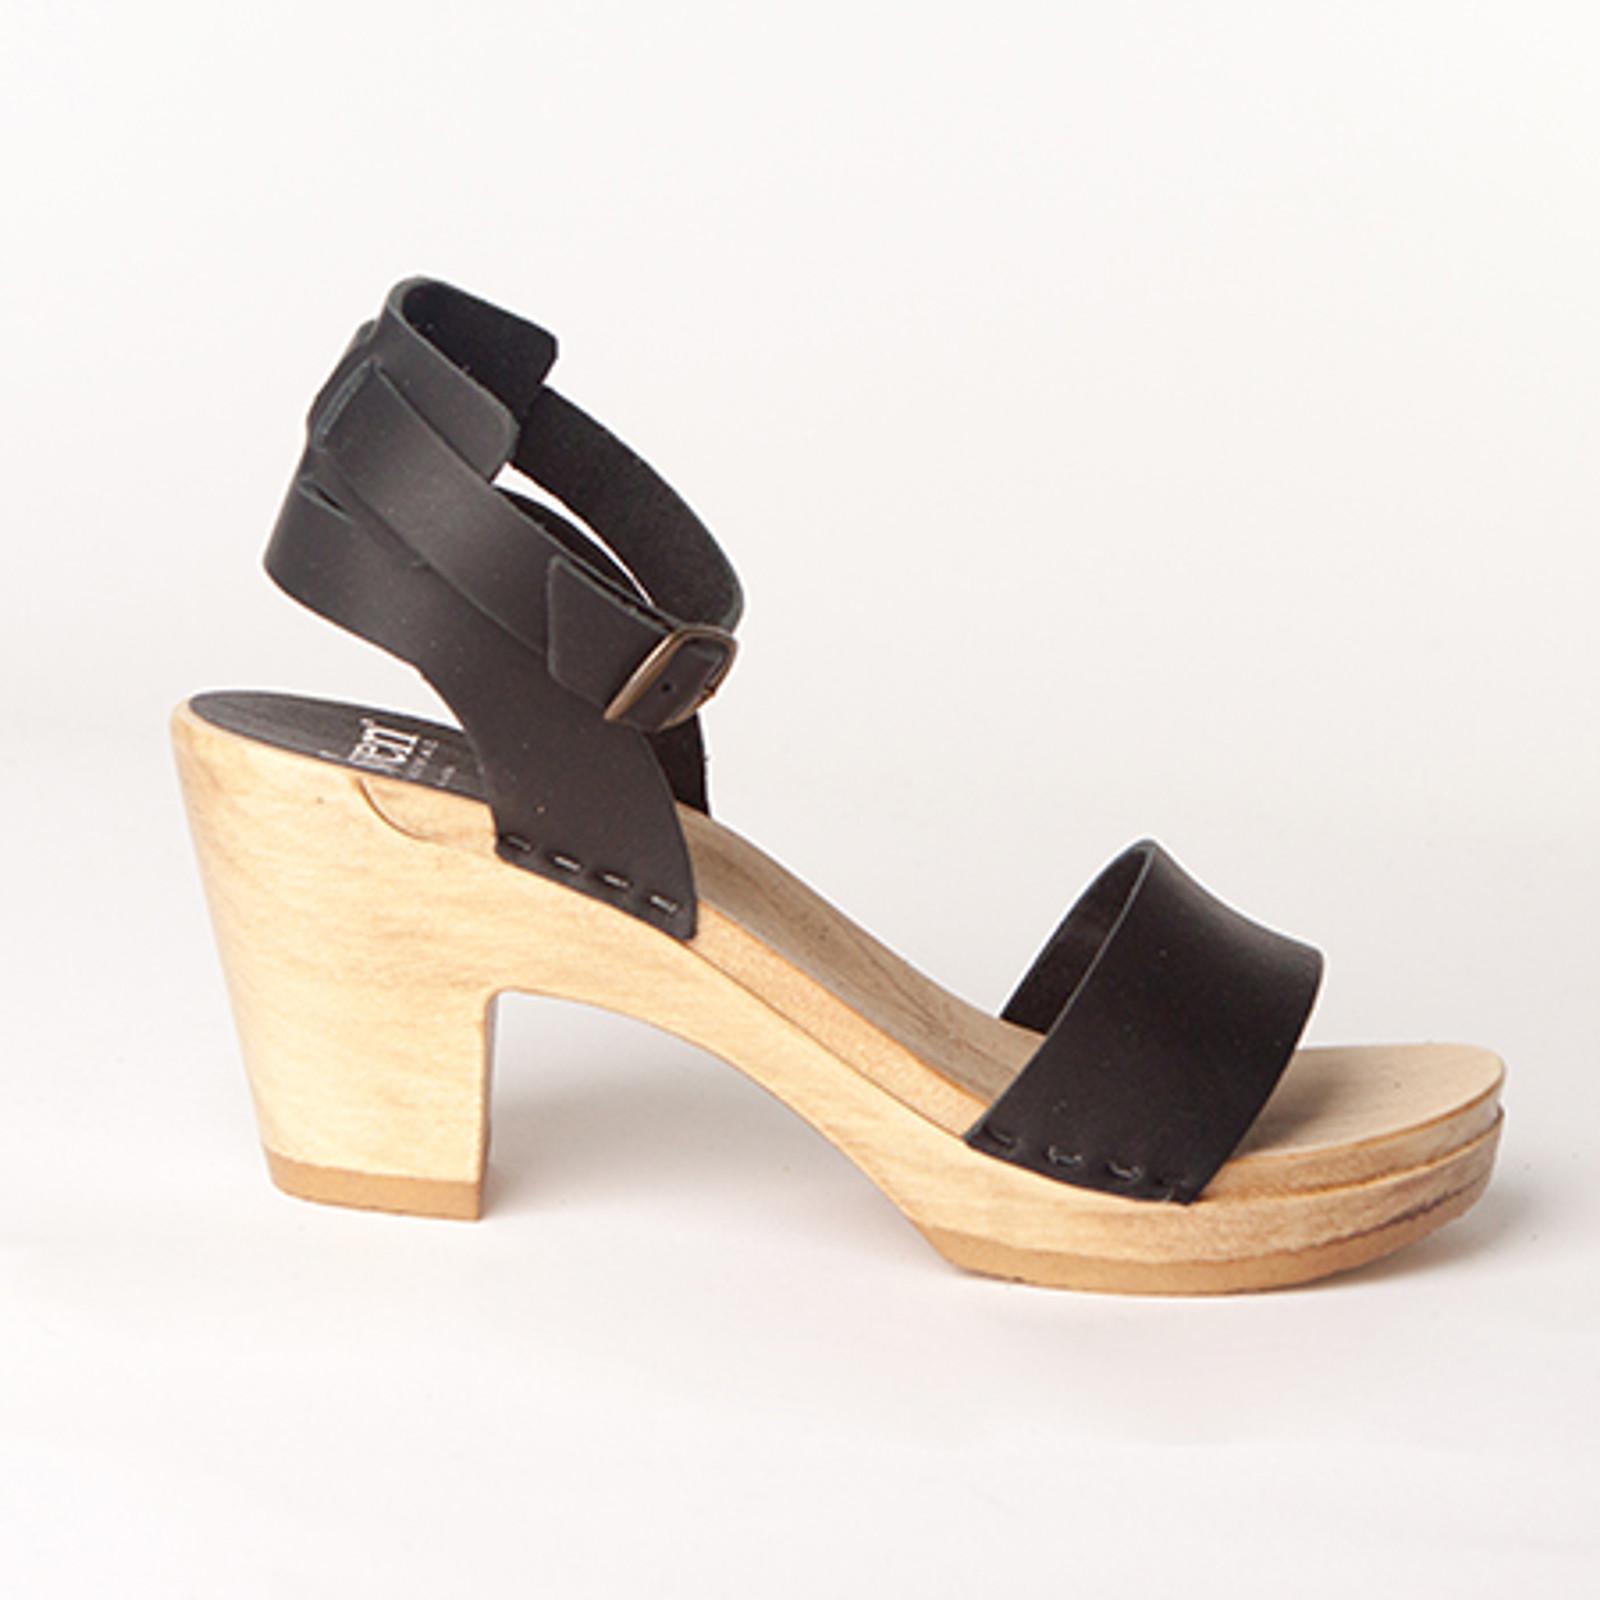 Ankle Wrap Strap - Sandal Clogs - High Heels